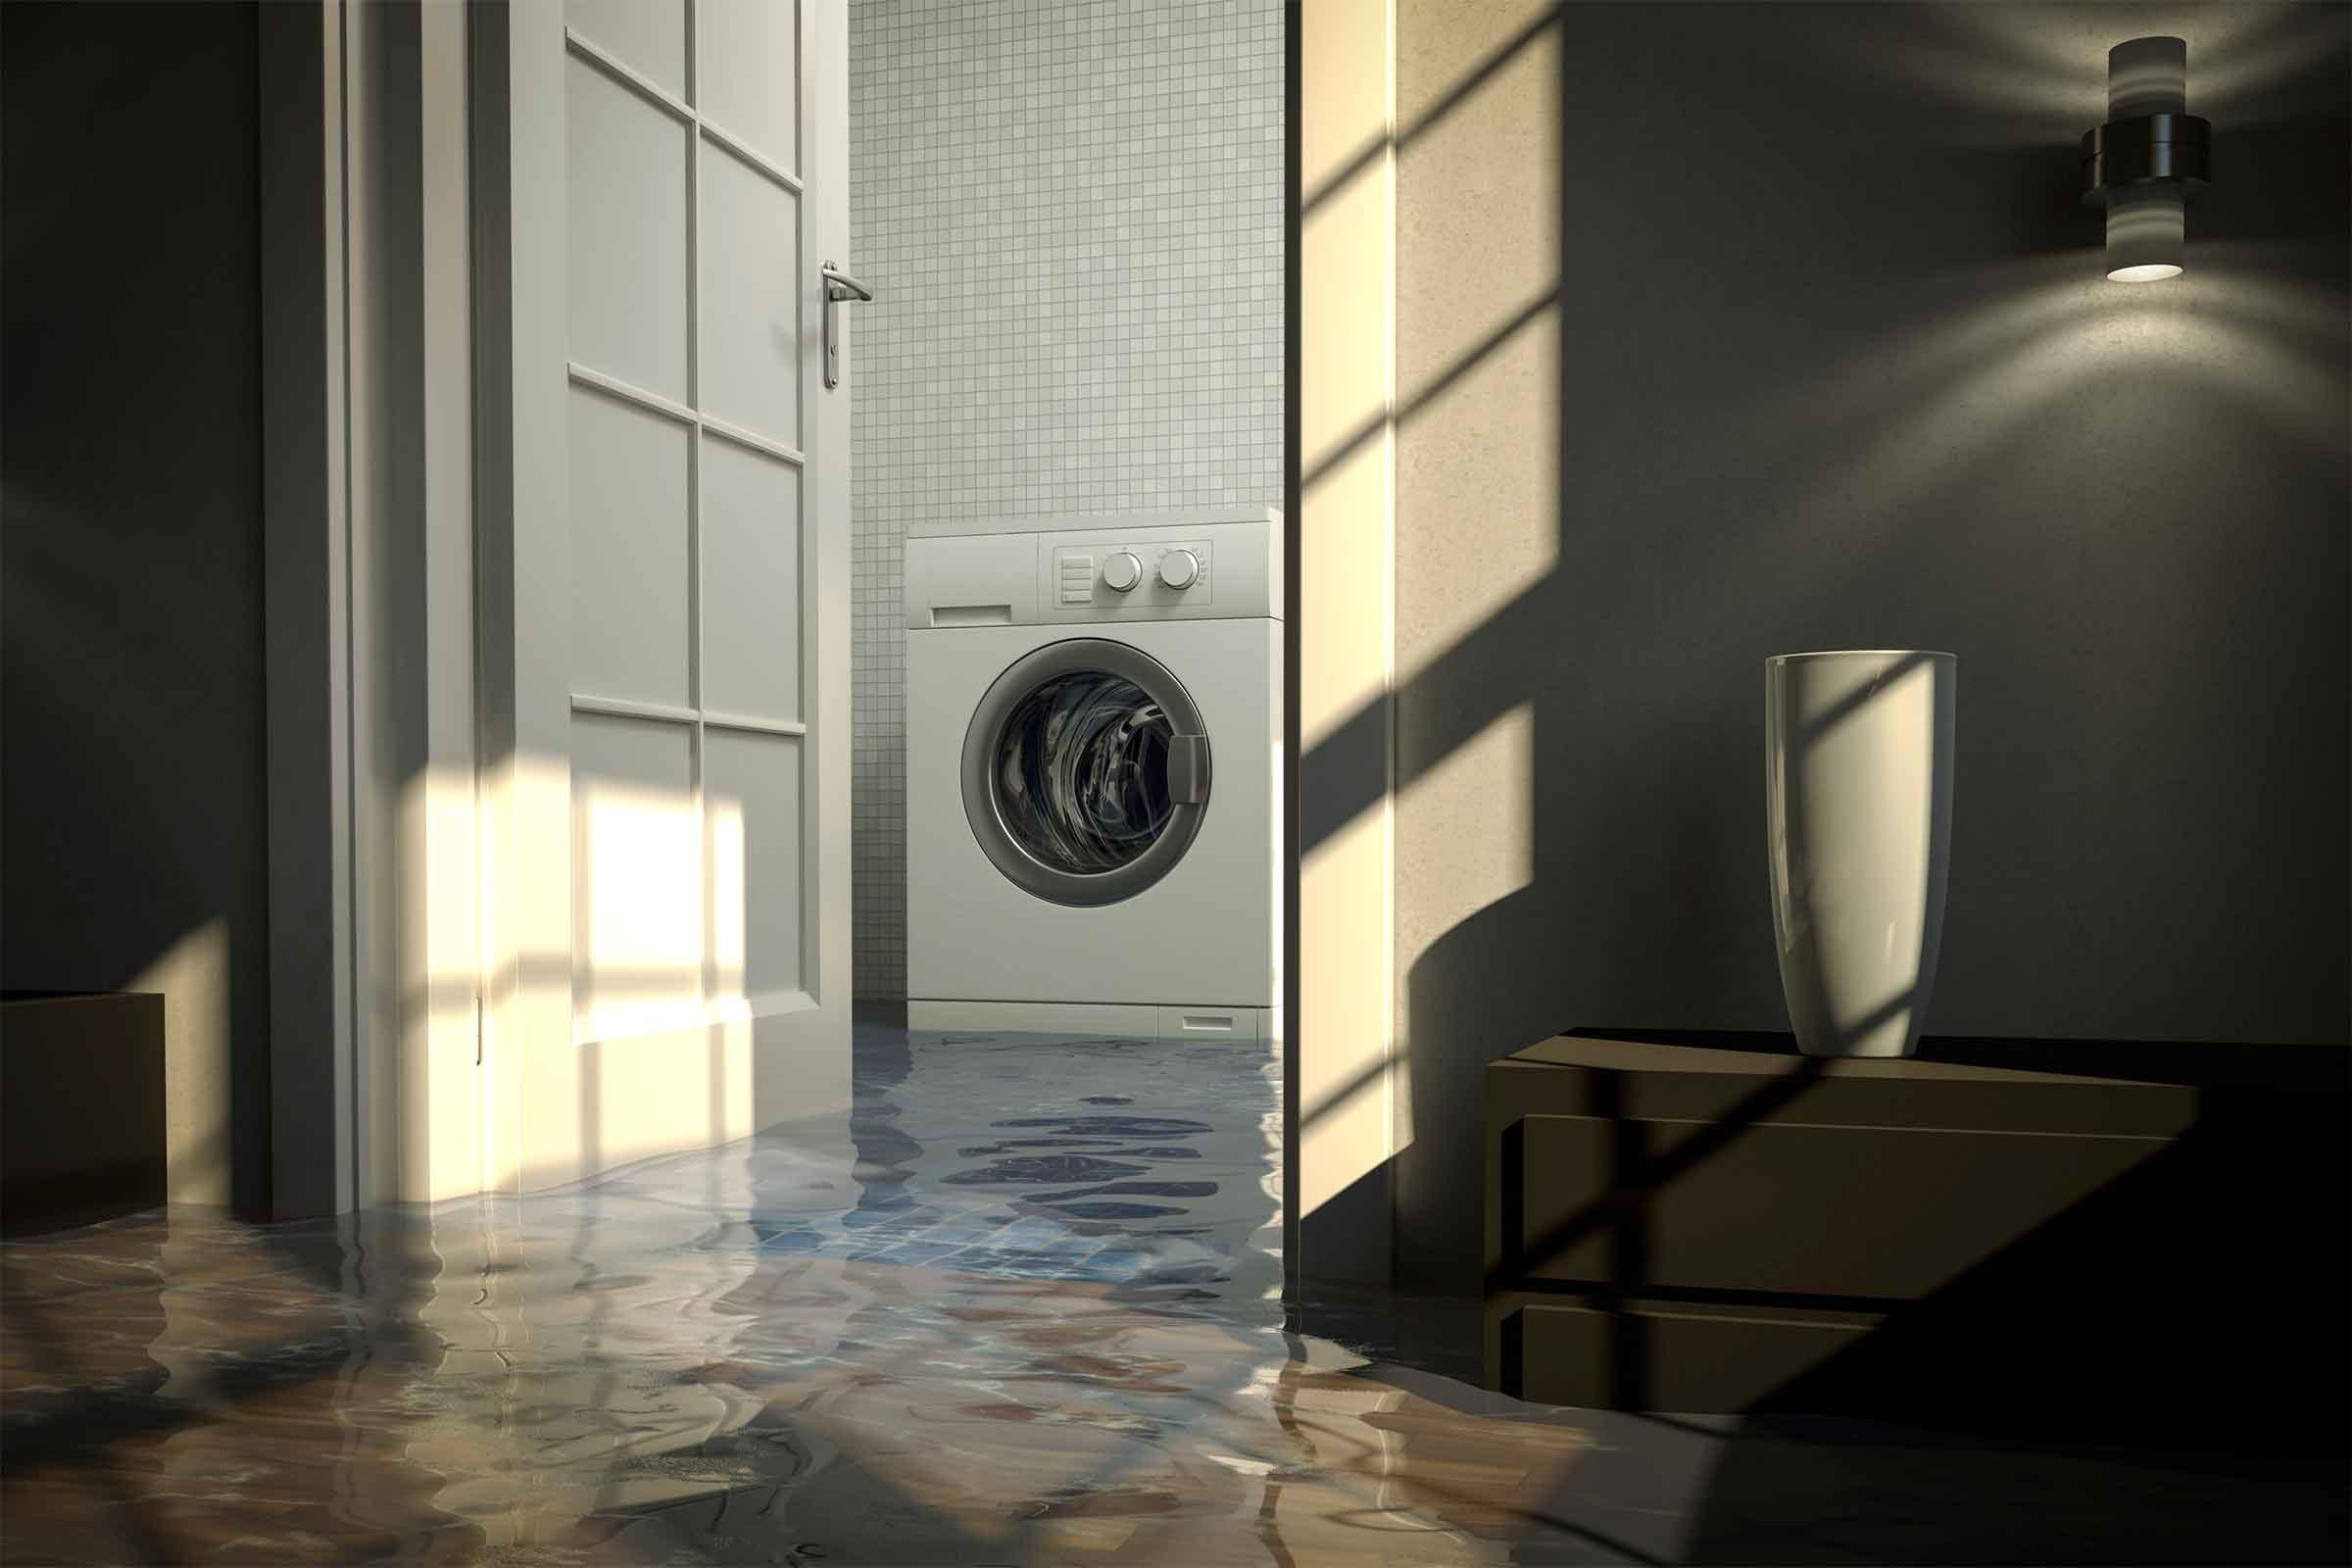 plumber tips plumbing repair secrets from experts reader 39 s digest. Black Bedroom Furniture Sets. Home Design Ideas